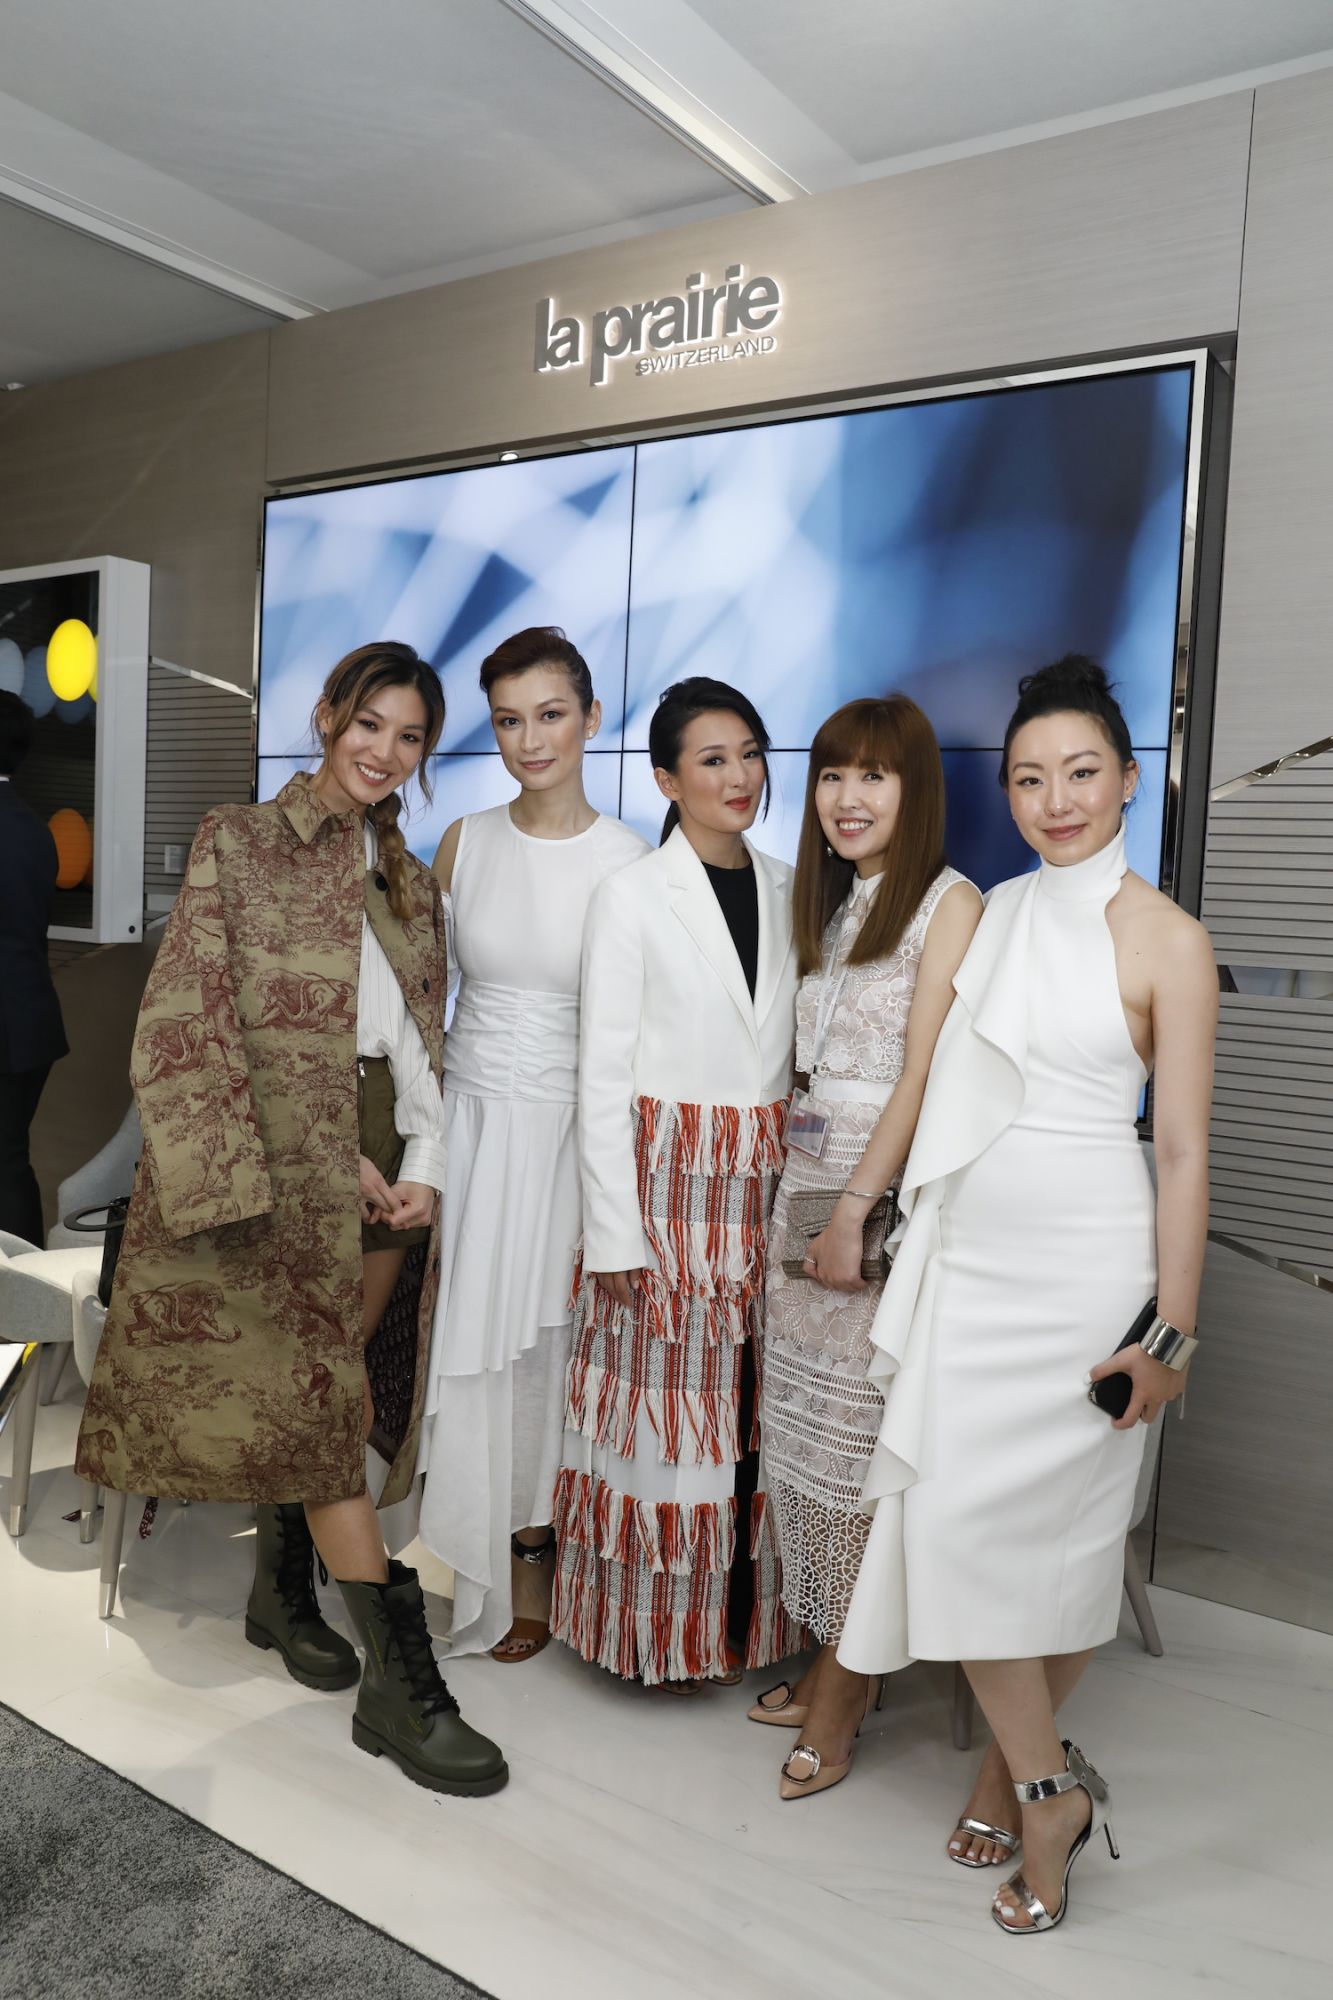 Alison Chan-El Azar, Colleen Fung, Antonia Li, Emmy Yuen, Ruth Chao